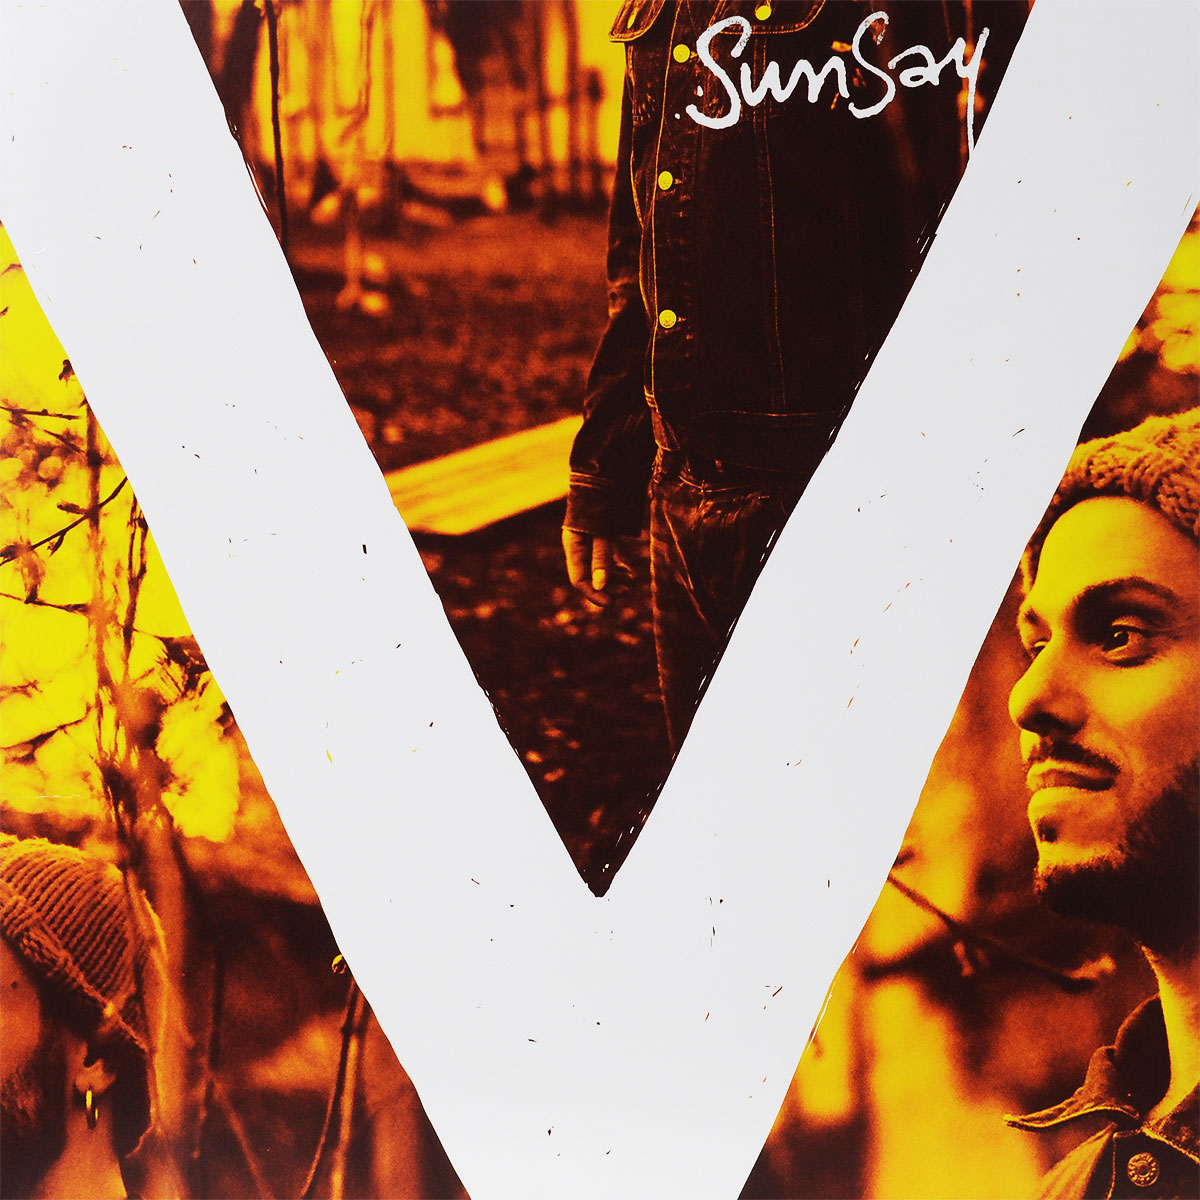 цены Sunsay SunSay. V (LP)